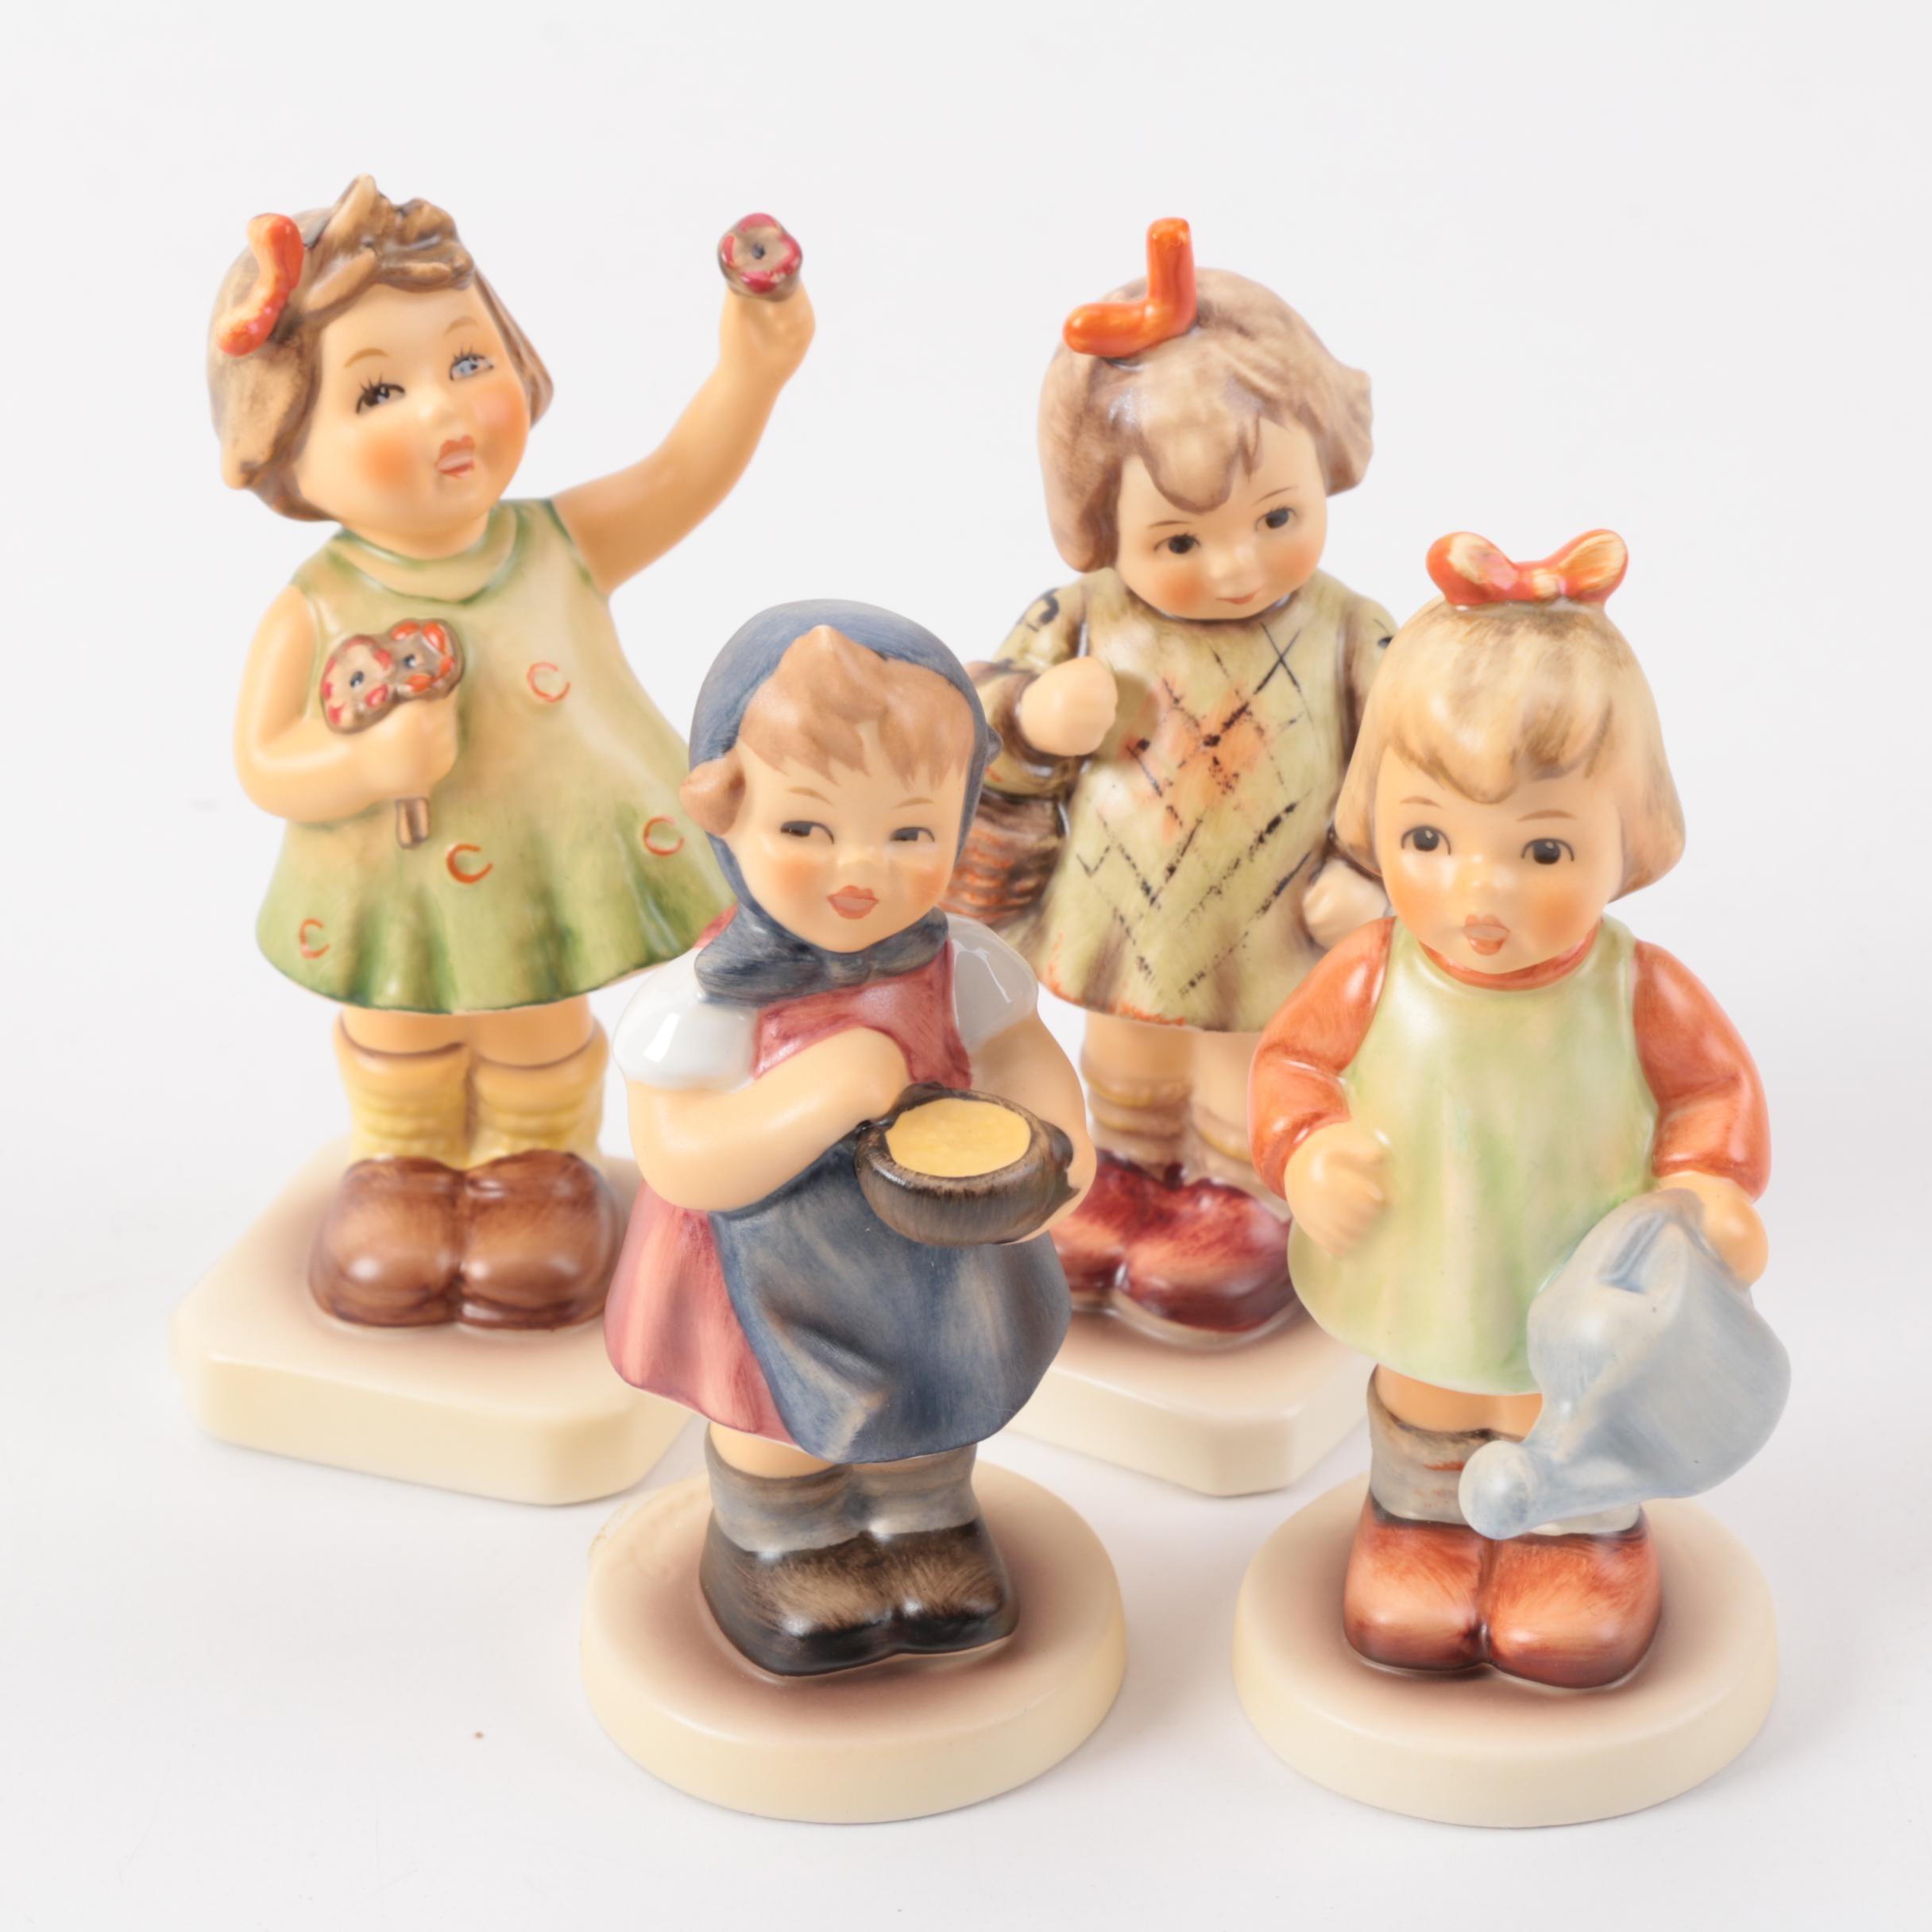 Goebel Hummel Figurines Featuring an M.I. Hummel Collector's Club Figurine